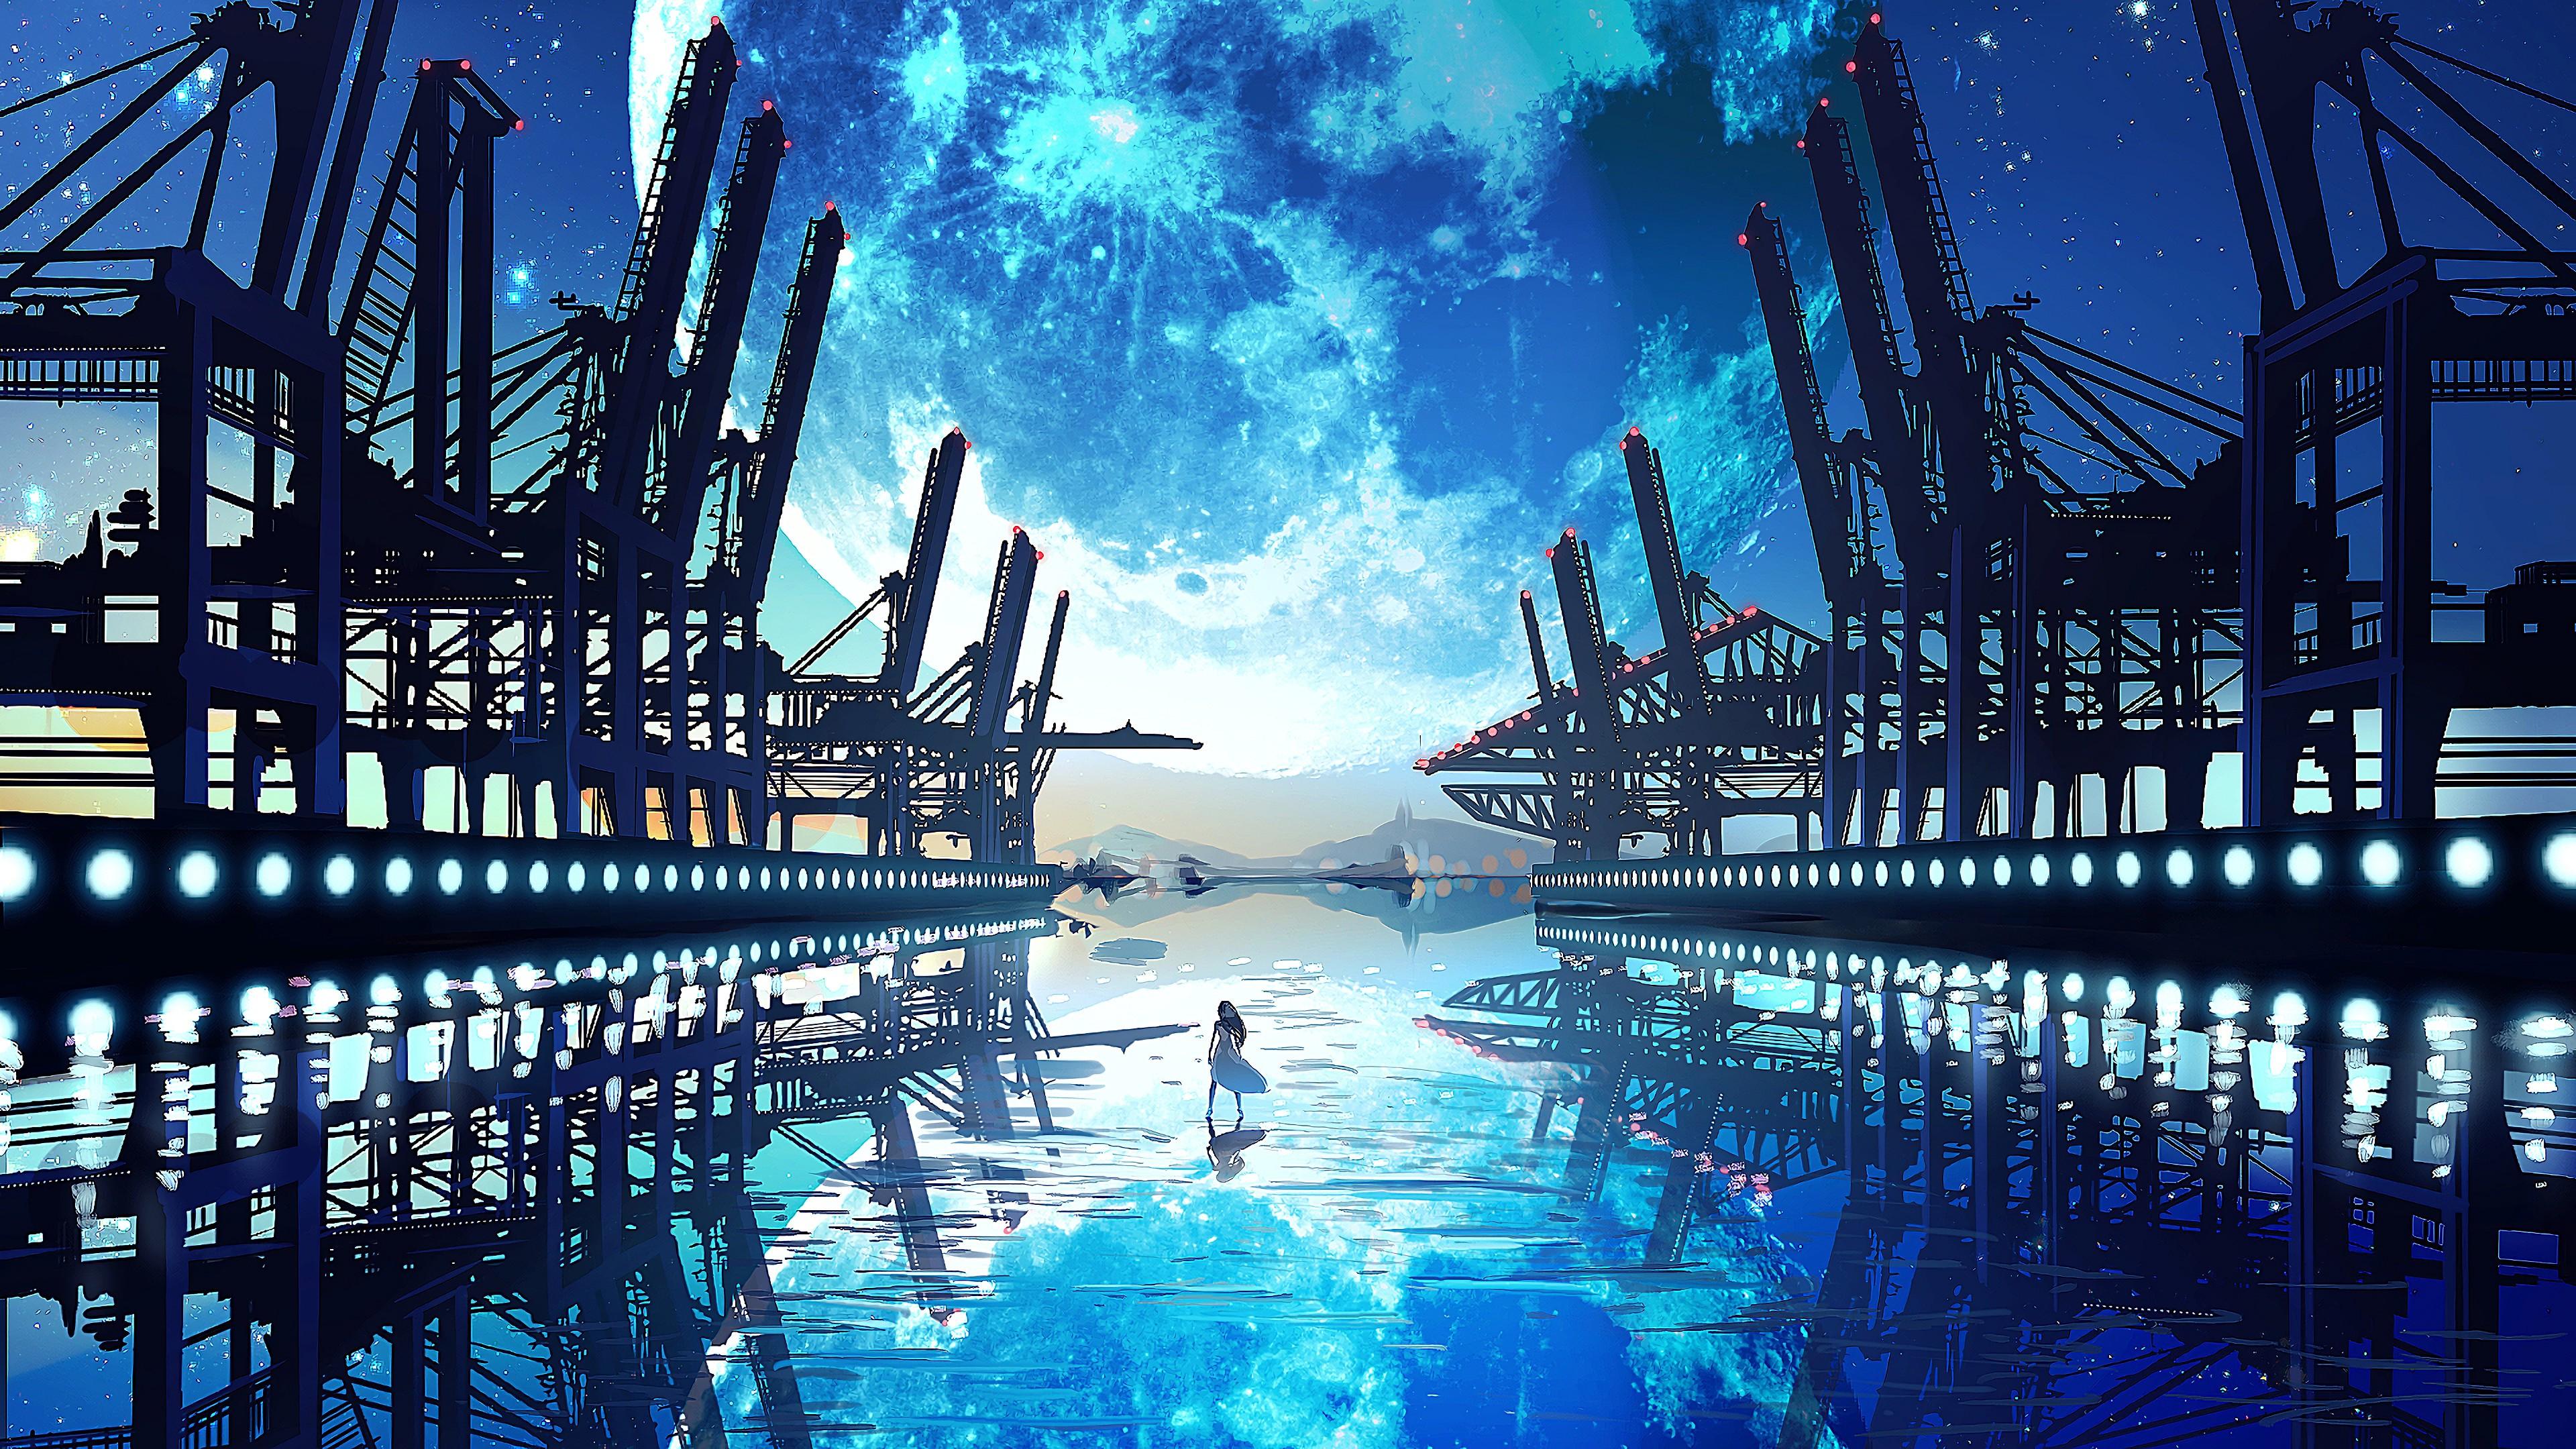 Anime Landscape Wallpaper 4k Posted By John Simpson